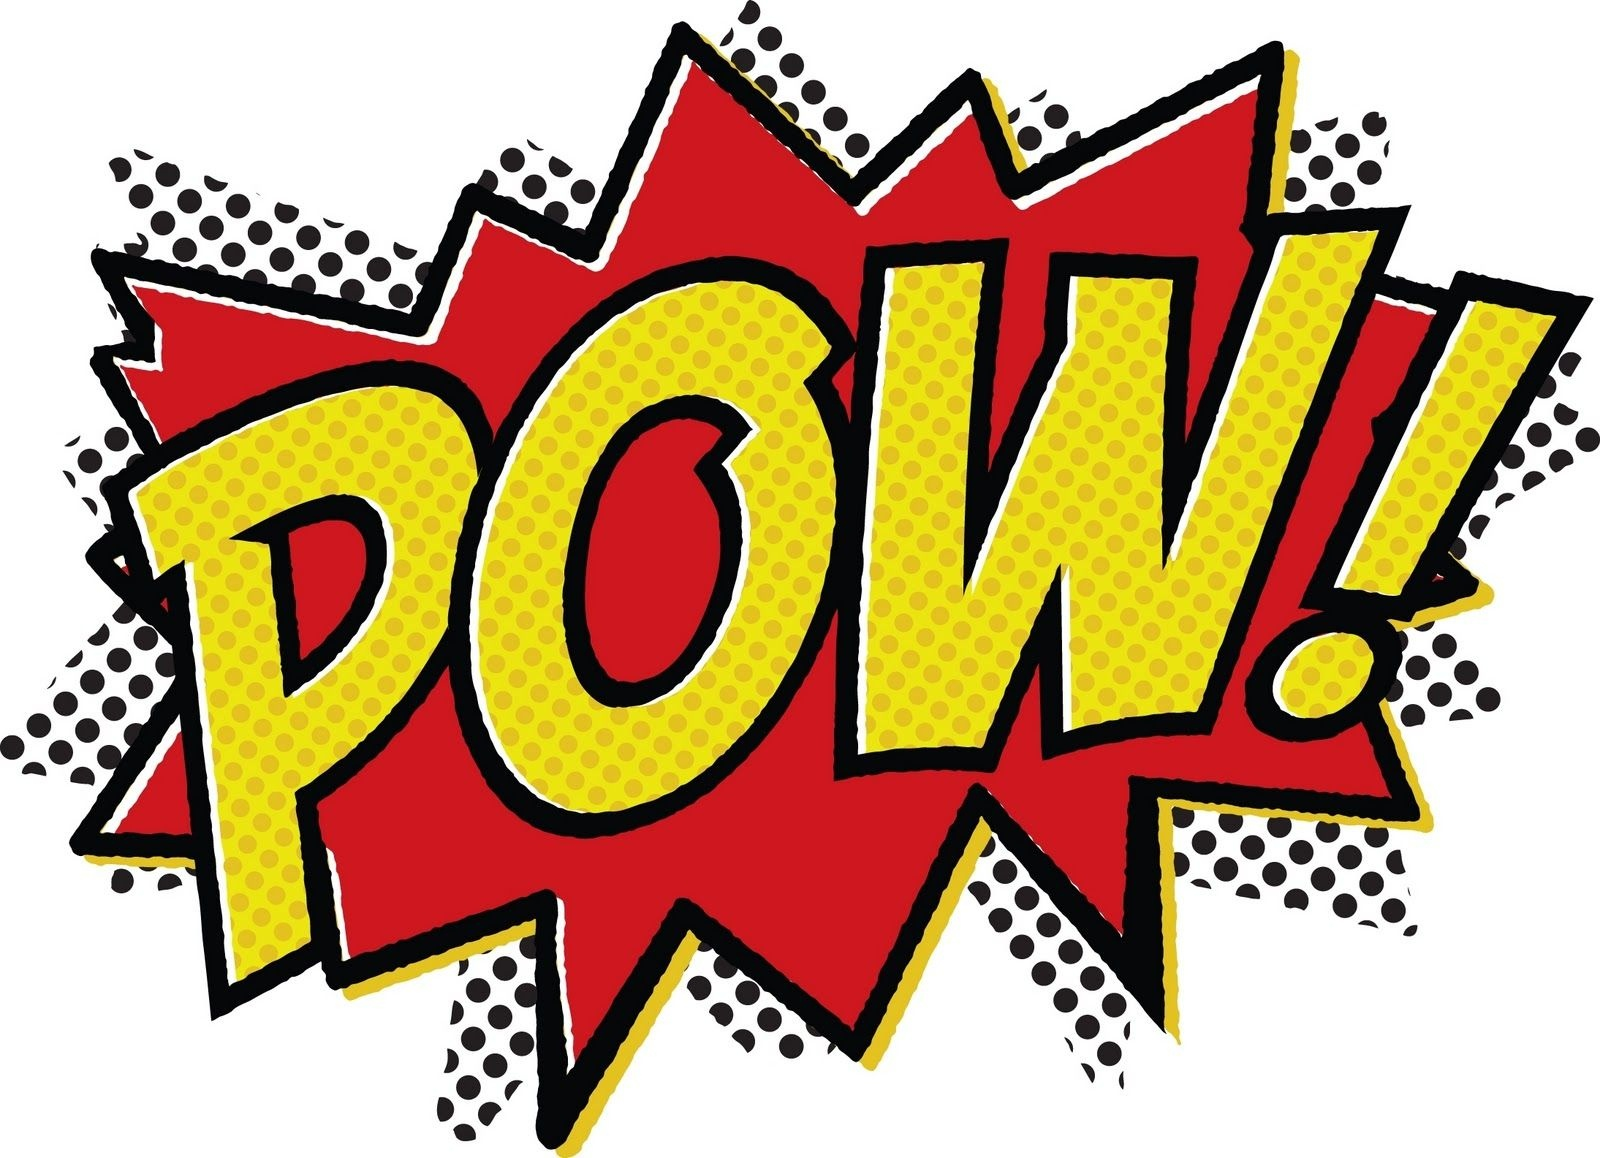 Superhero Printables In 2019 | Printables | Superhero Birthday Party - Free Printable Superhero Words